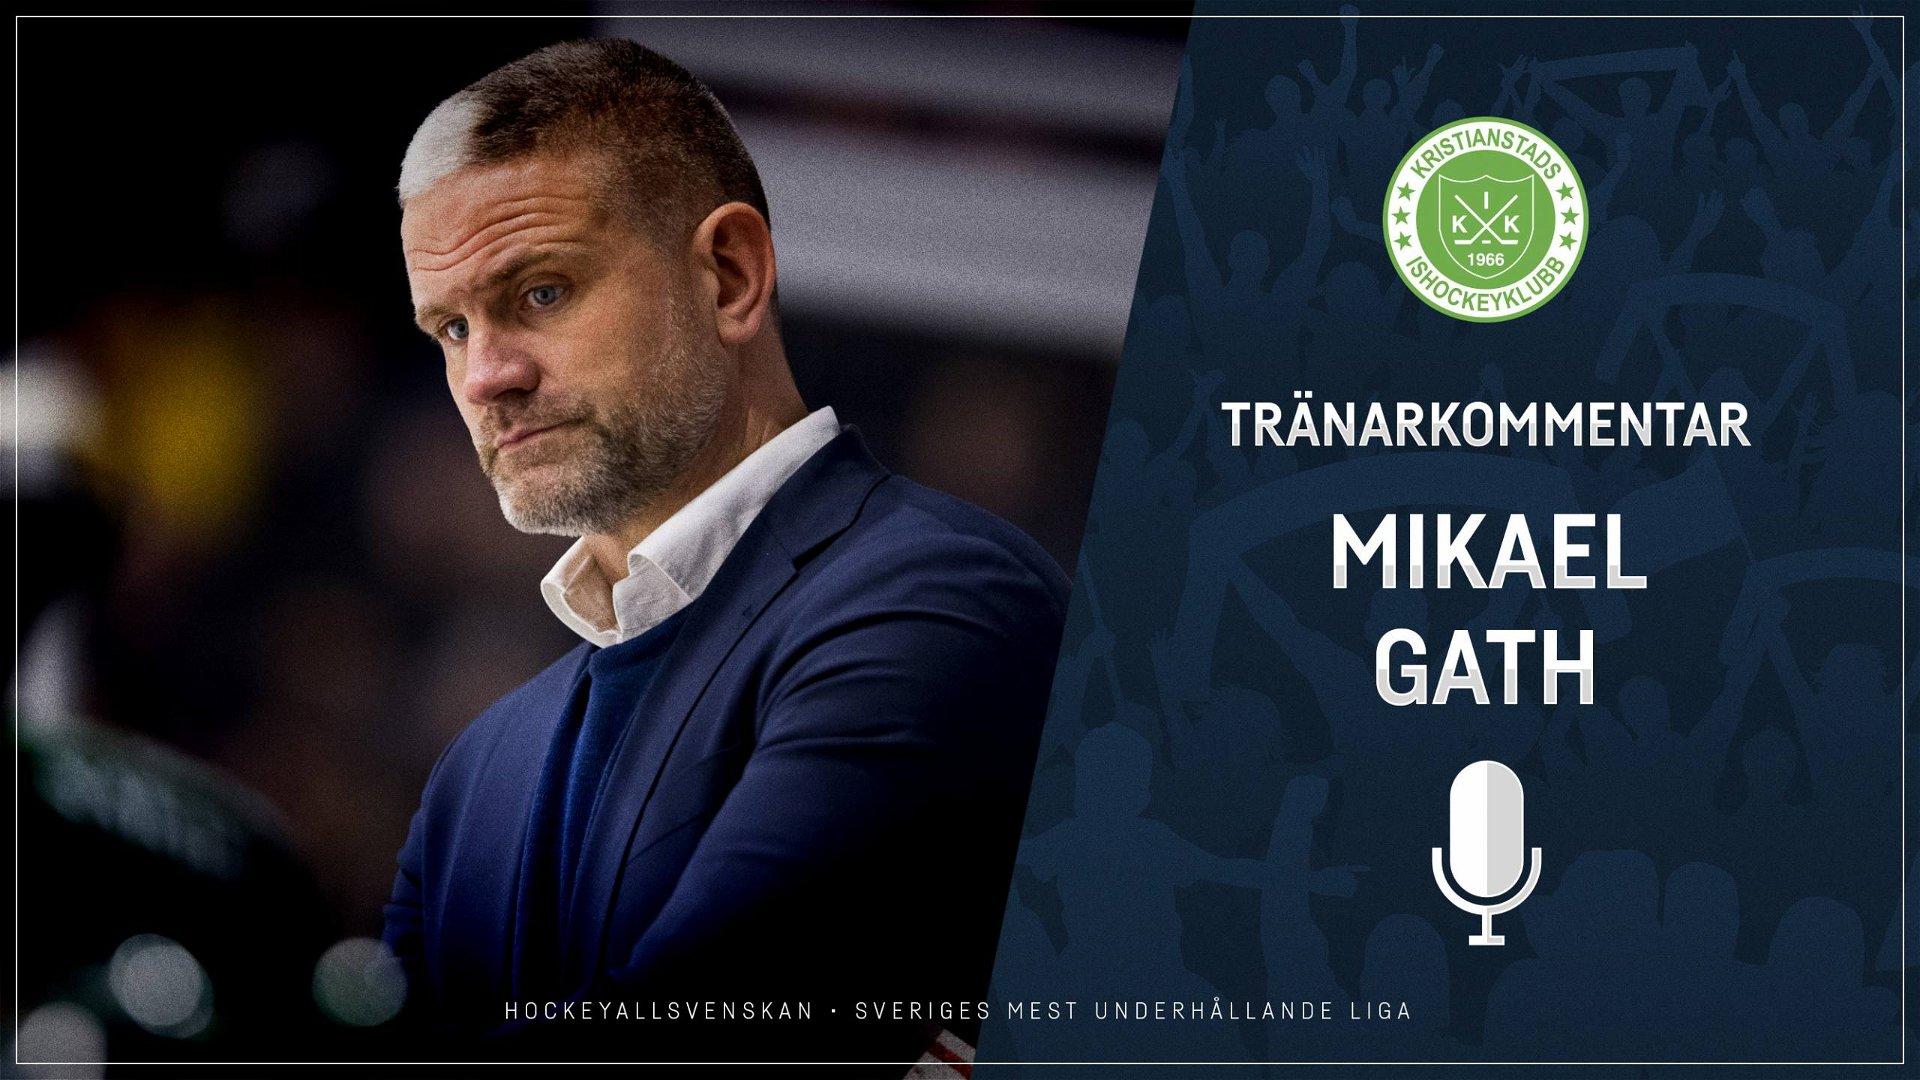 2021-01-11 Segerintervju: Mikael Gath